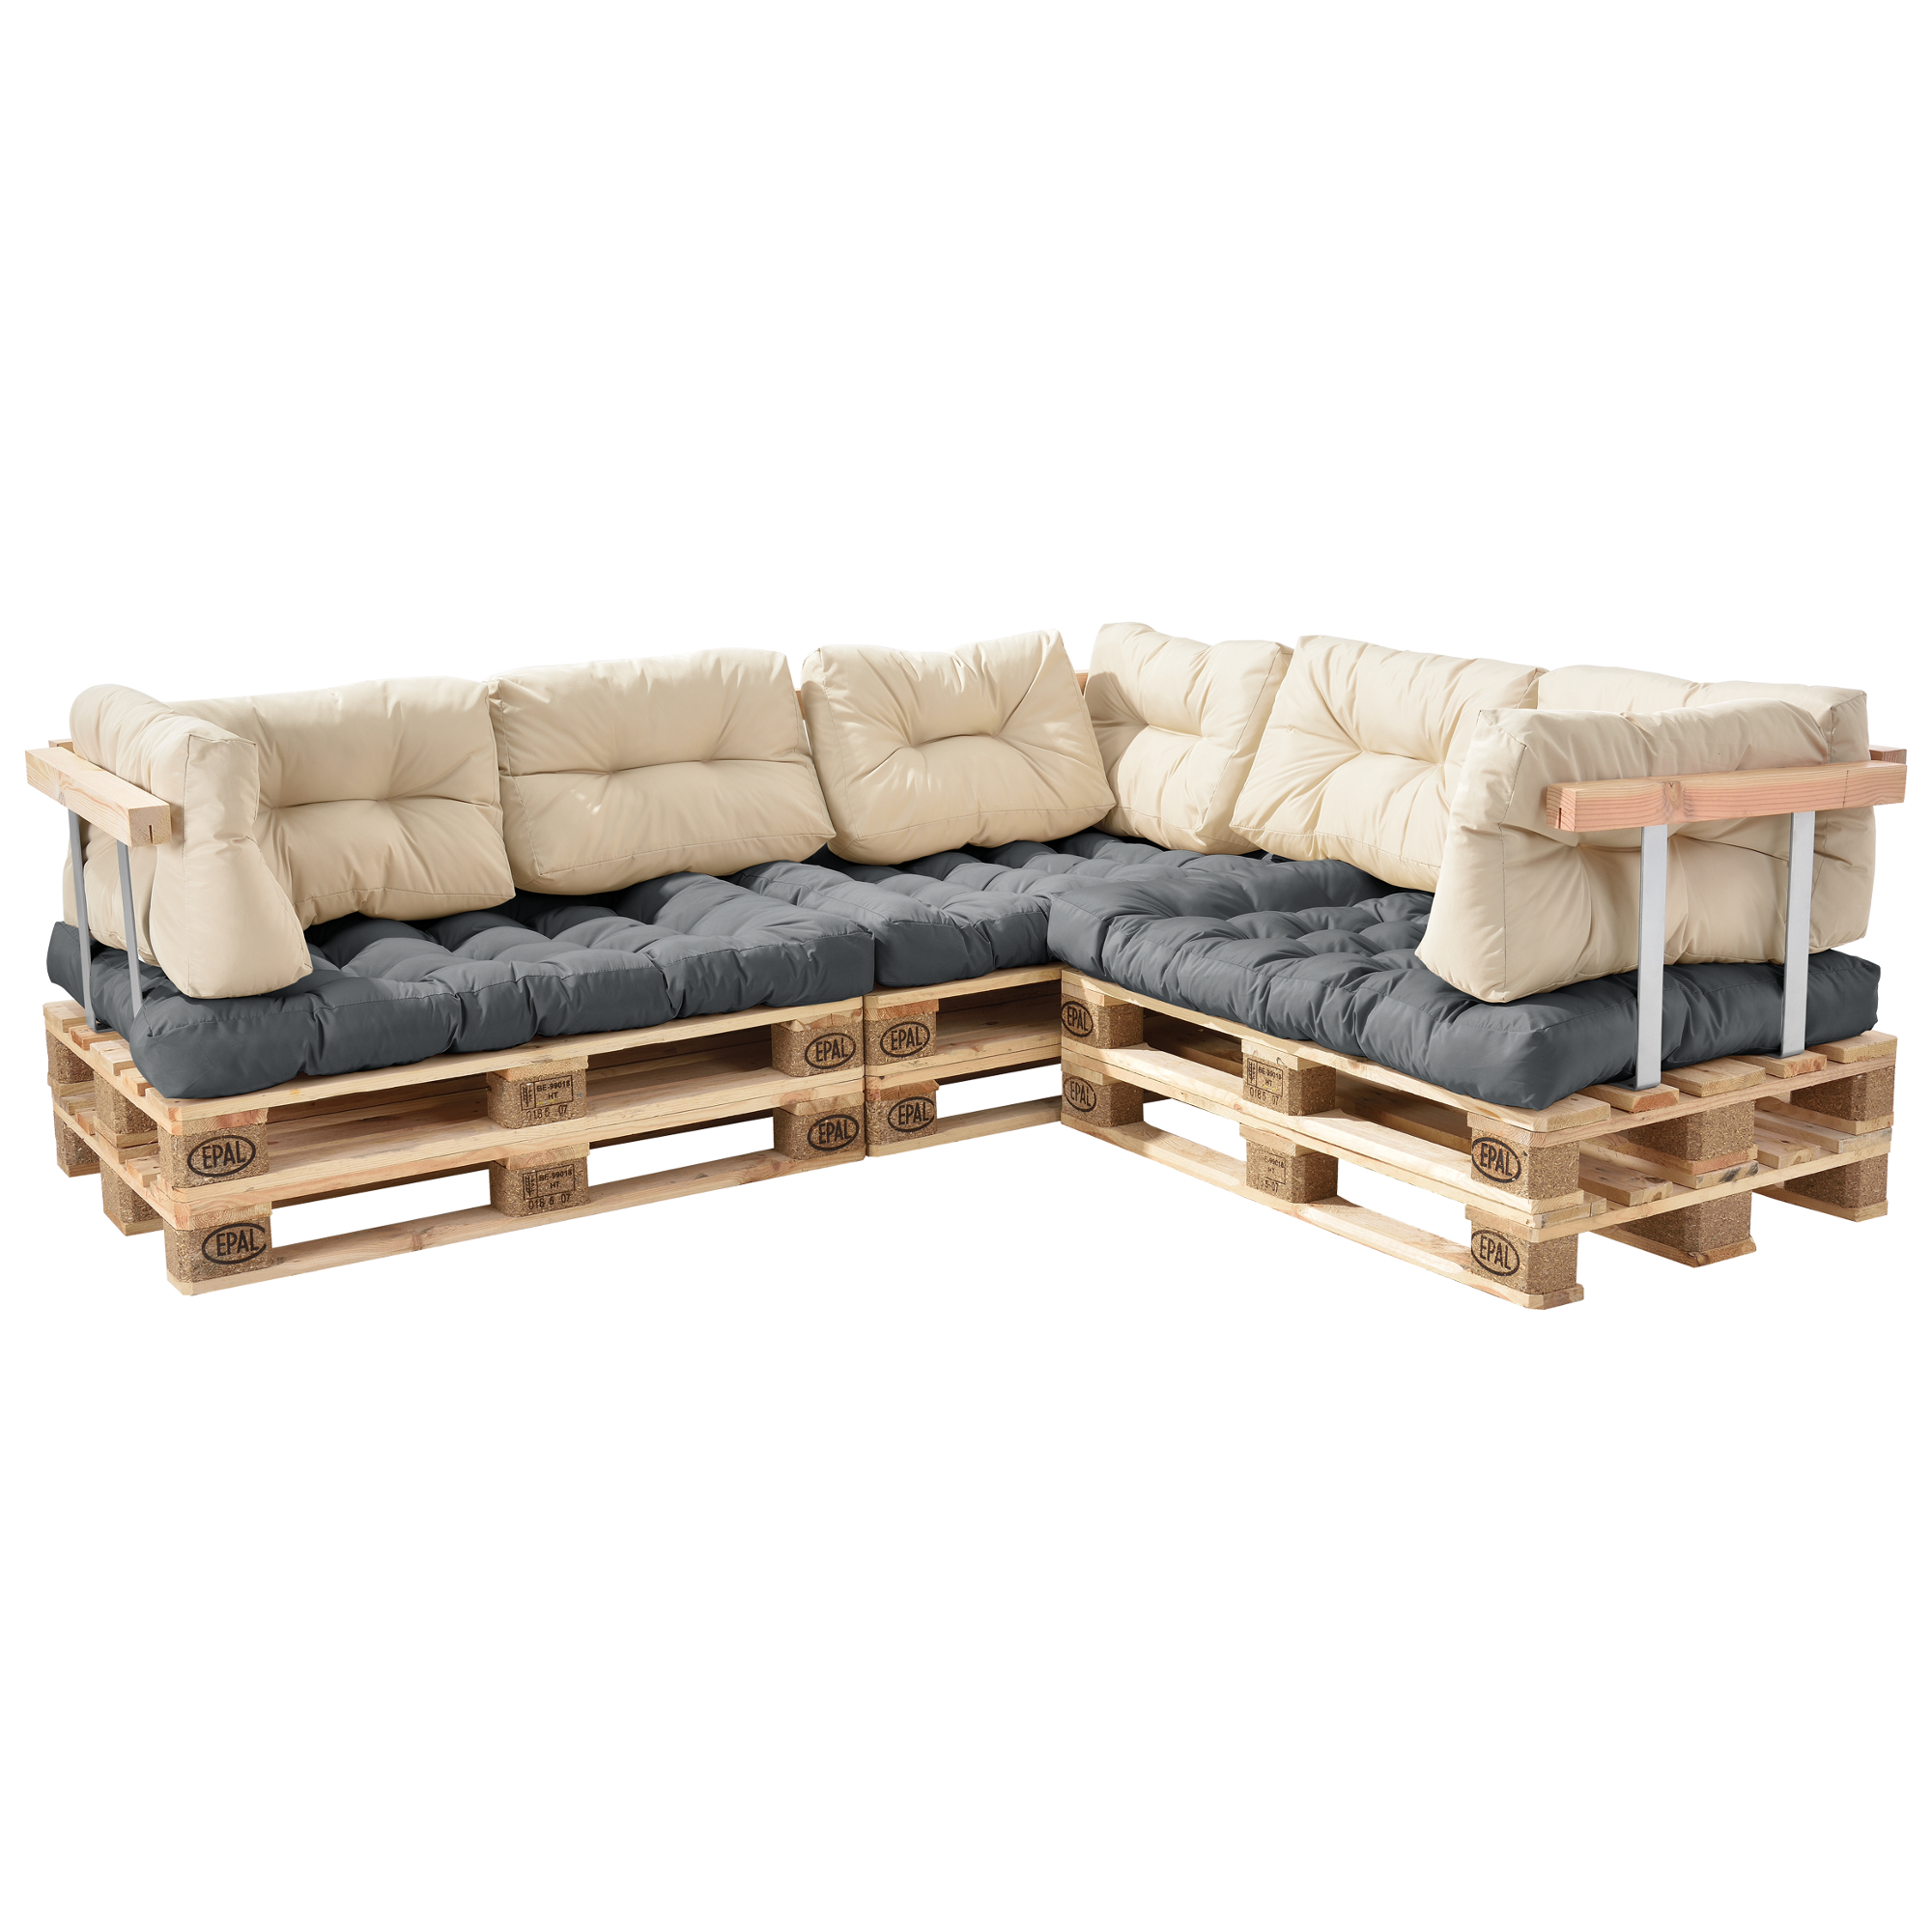 Palettenkissen in outdoor paletten kissen sofa for Colchoneta sofa exterior